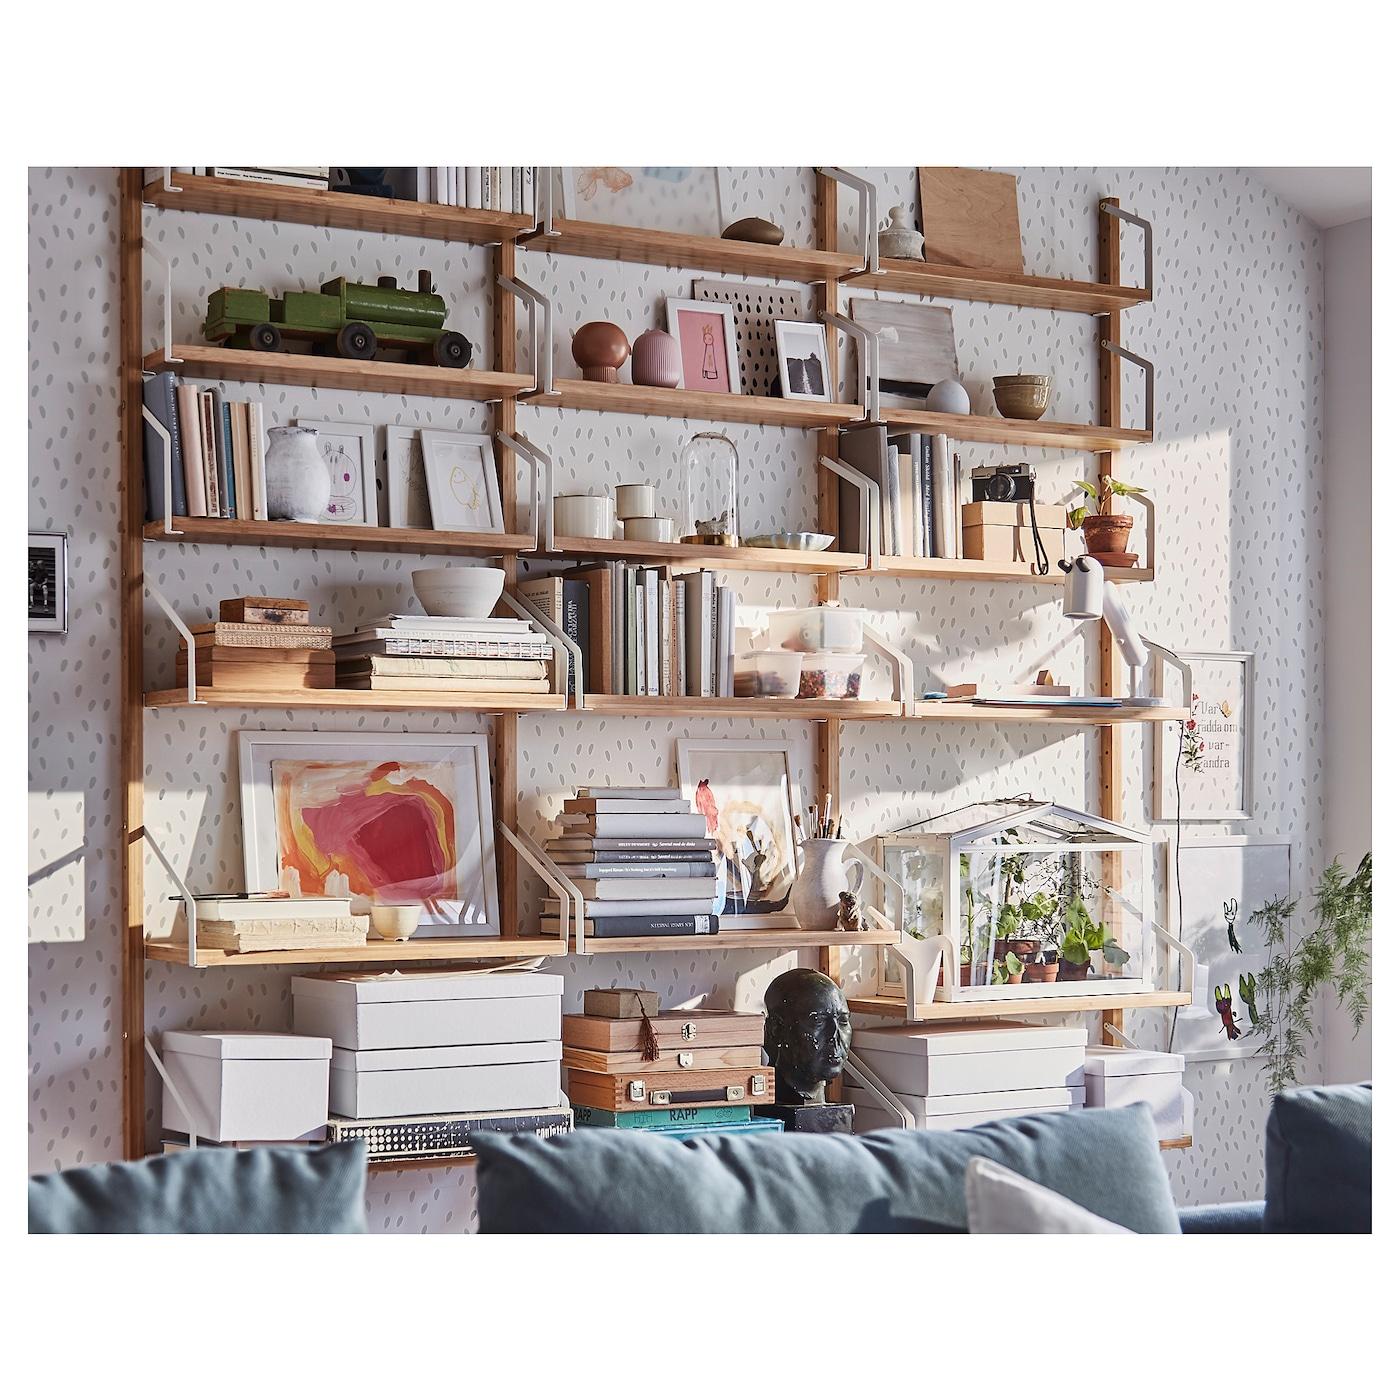 Svalnas Shelf Bamboo Width 24 Depth 9 7 8 Shop Online Or In